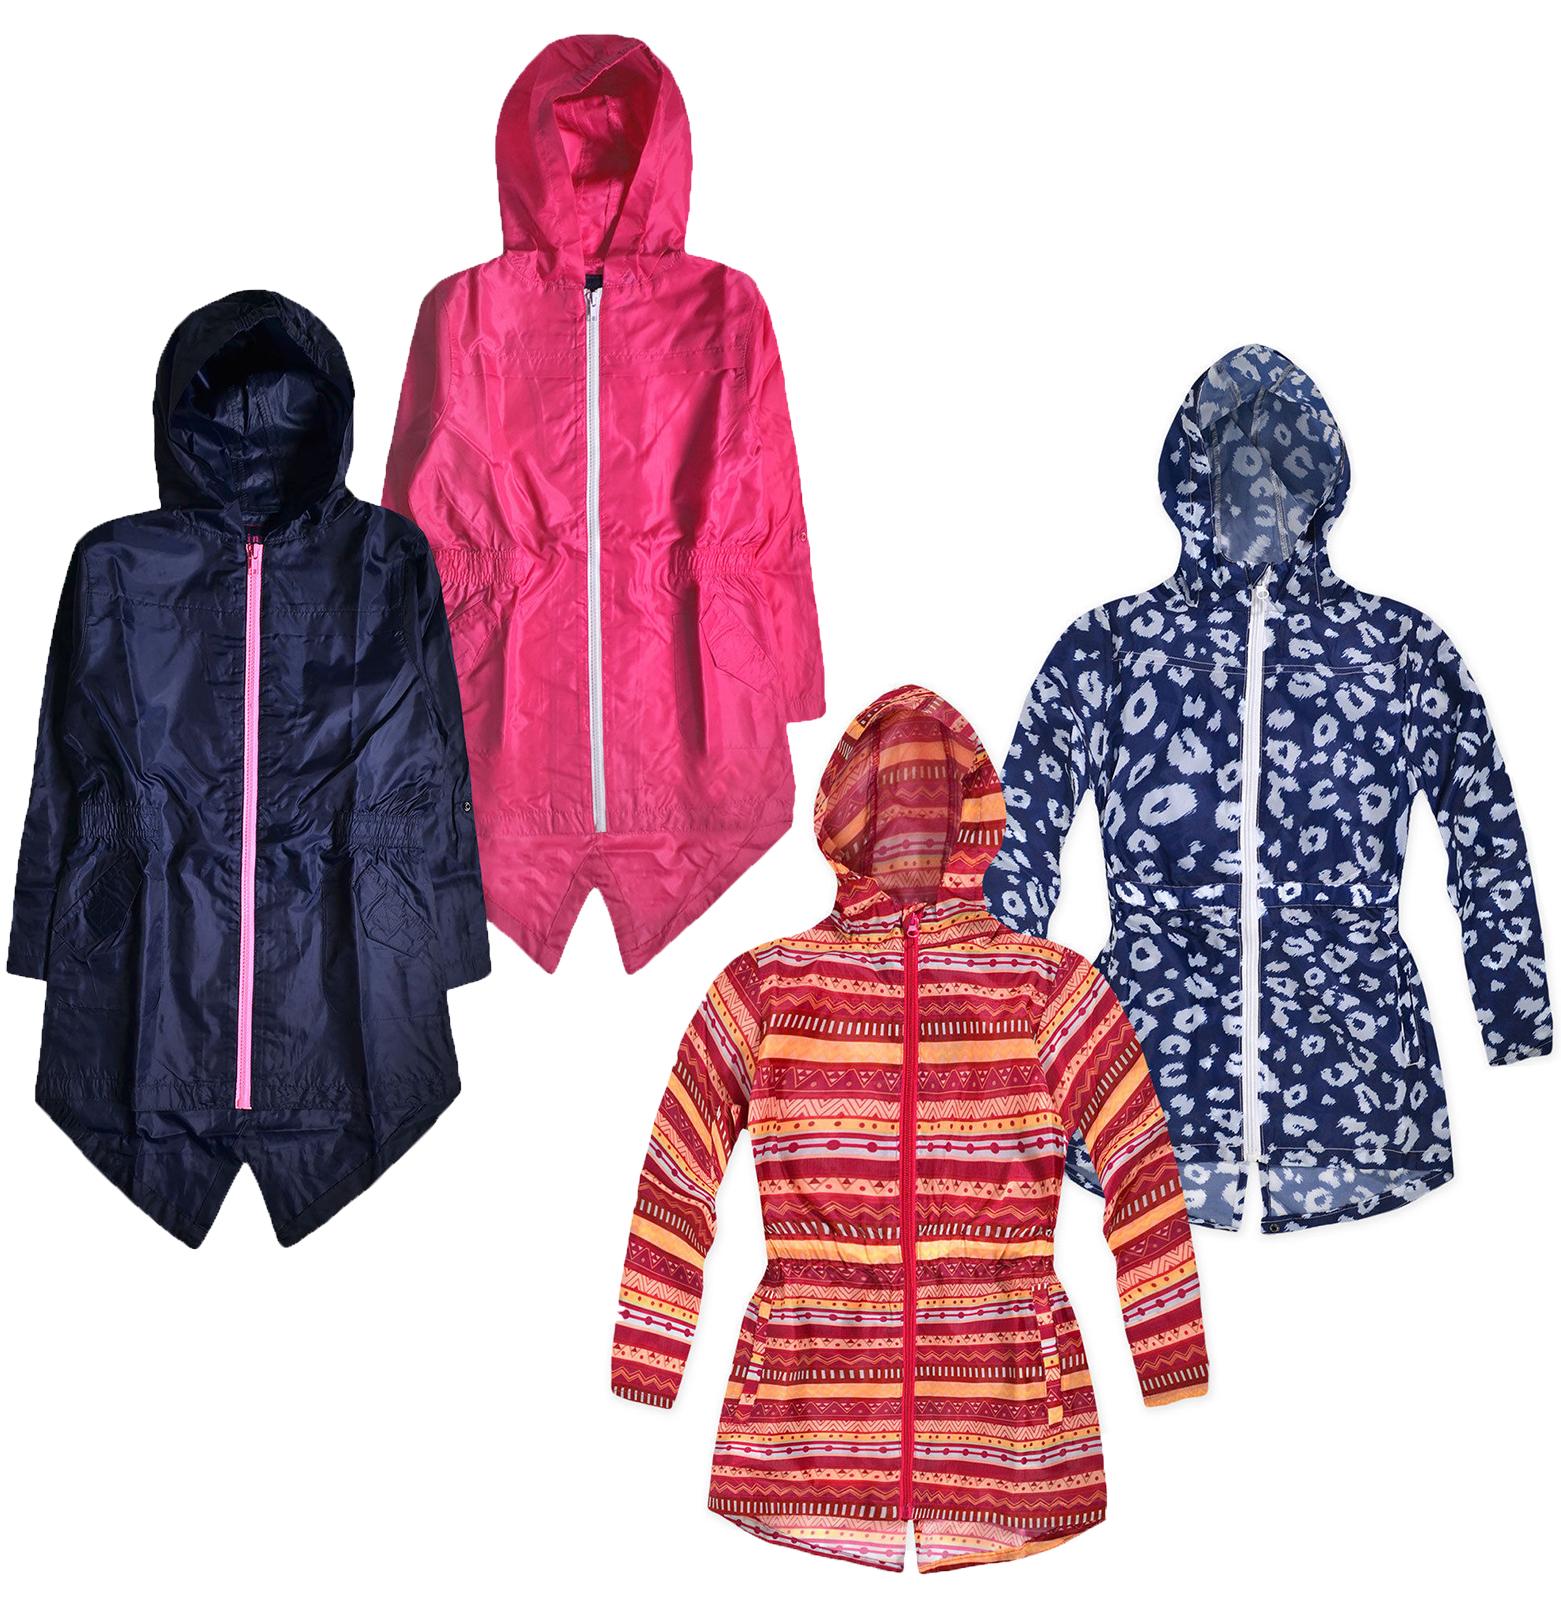 e697e5ae7 Girls Waterproof Parka Jacket Kids Hooded Lightweight Rain coat Ages 2 - 8  Years